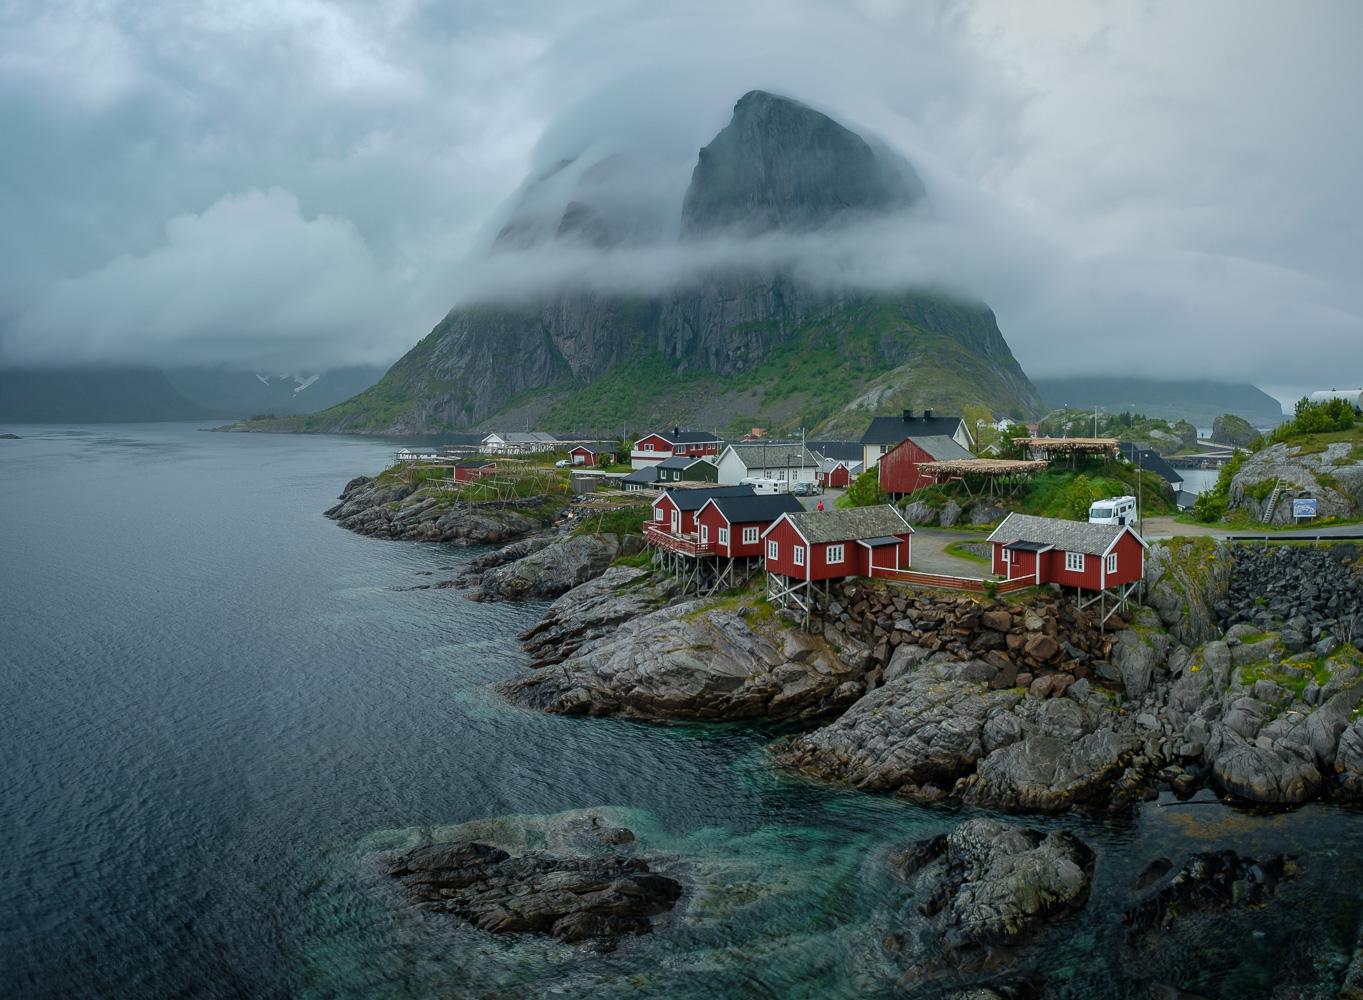 The small hamlet of Hamnoy, Lofoten Archipelago, Norway.